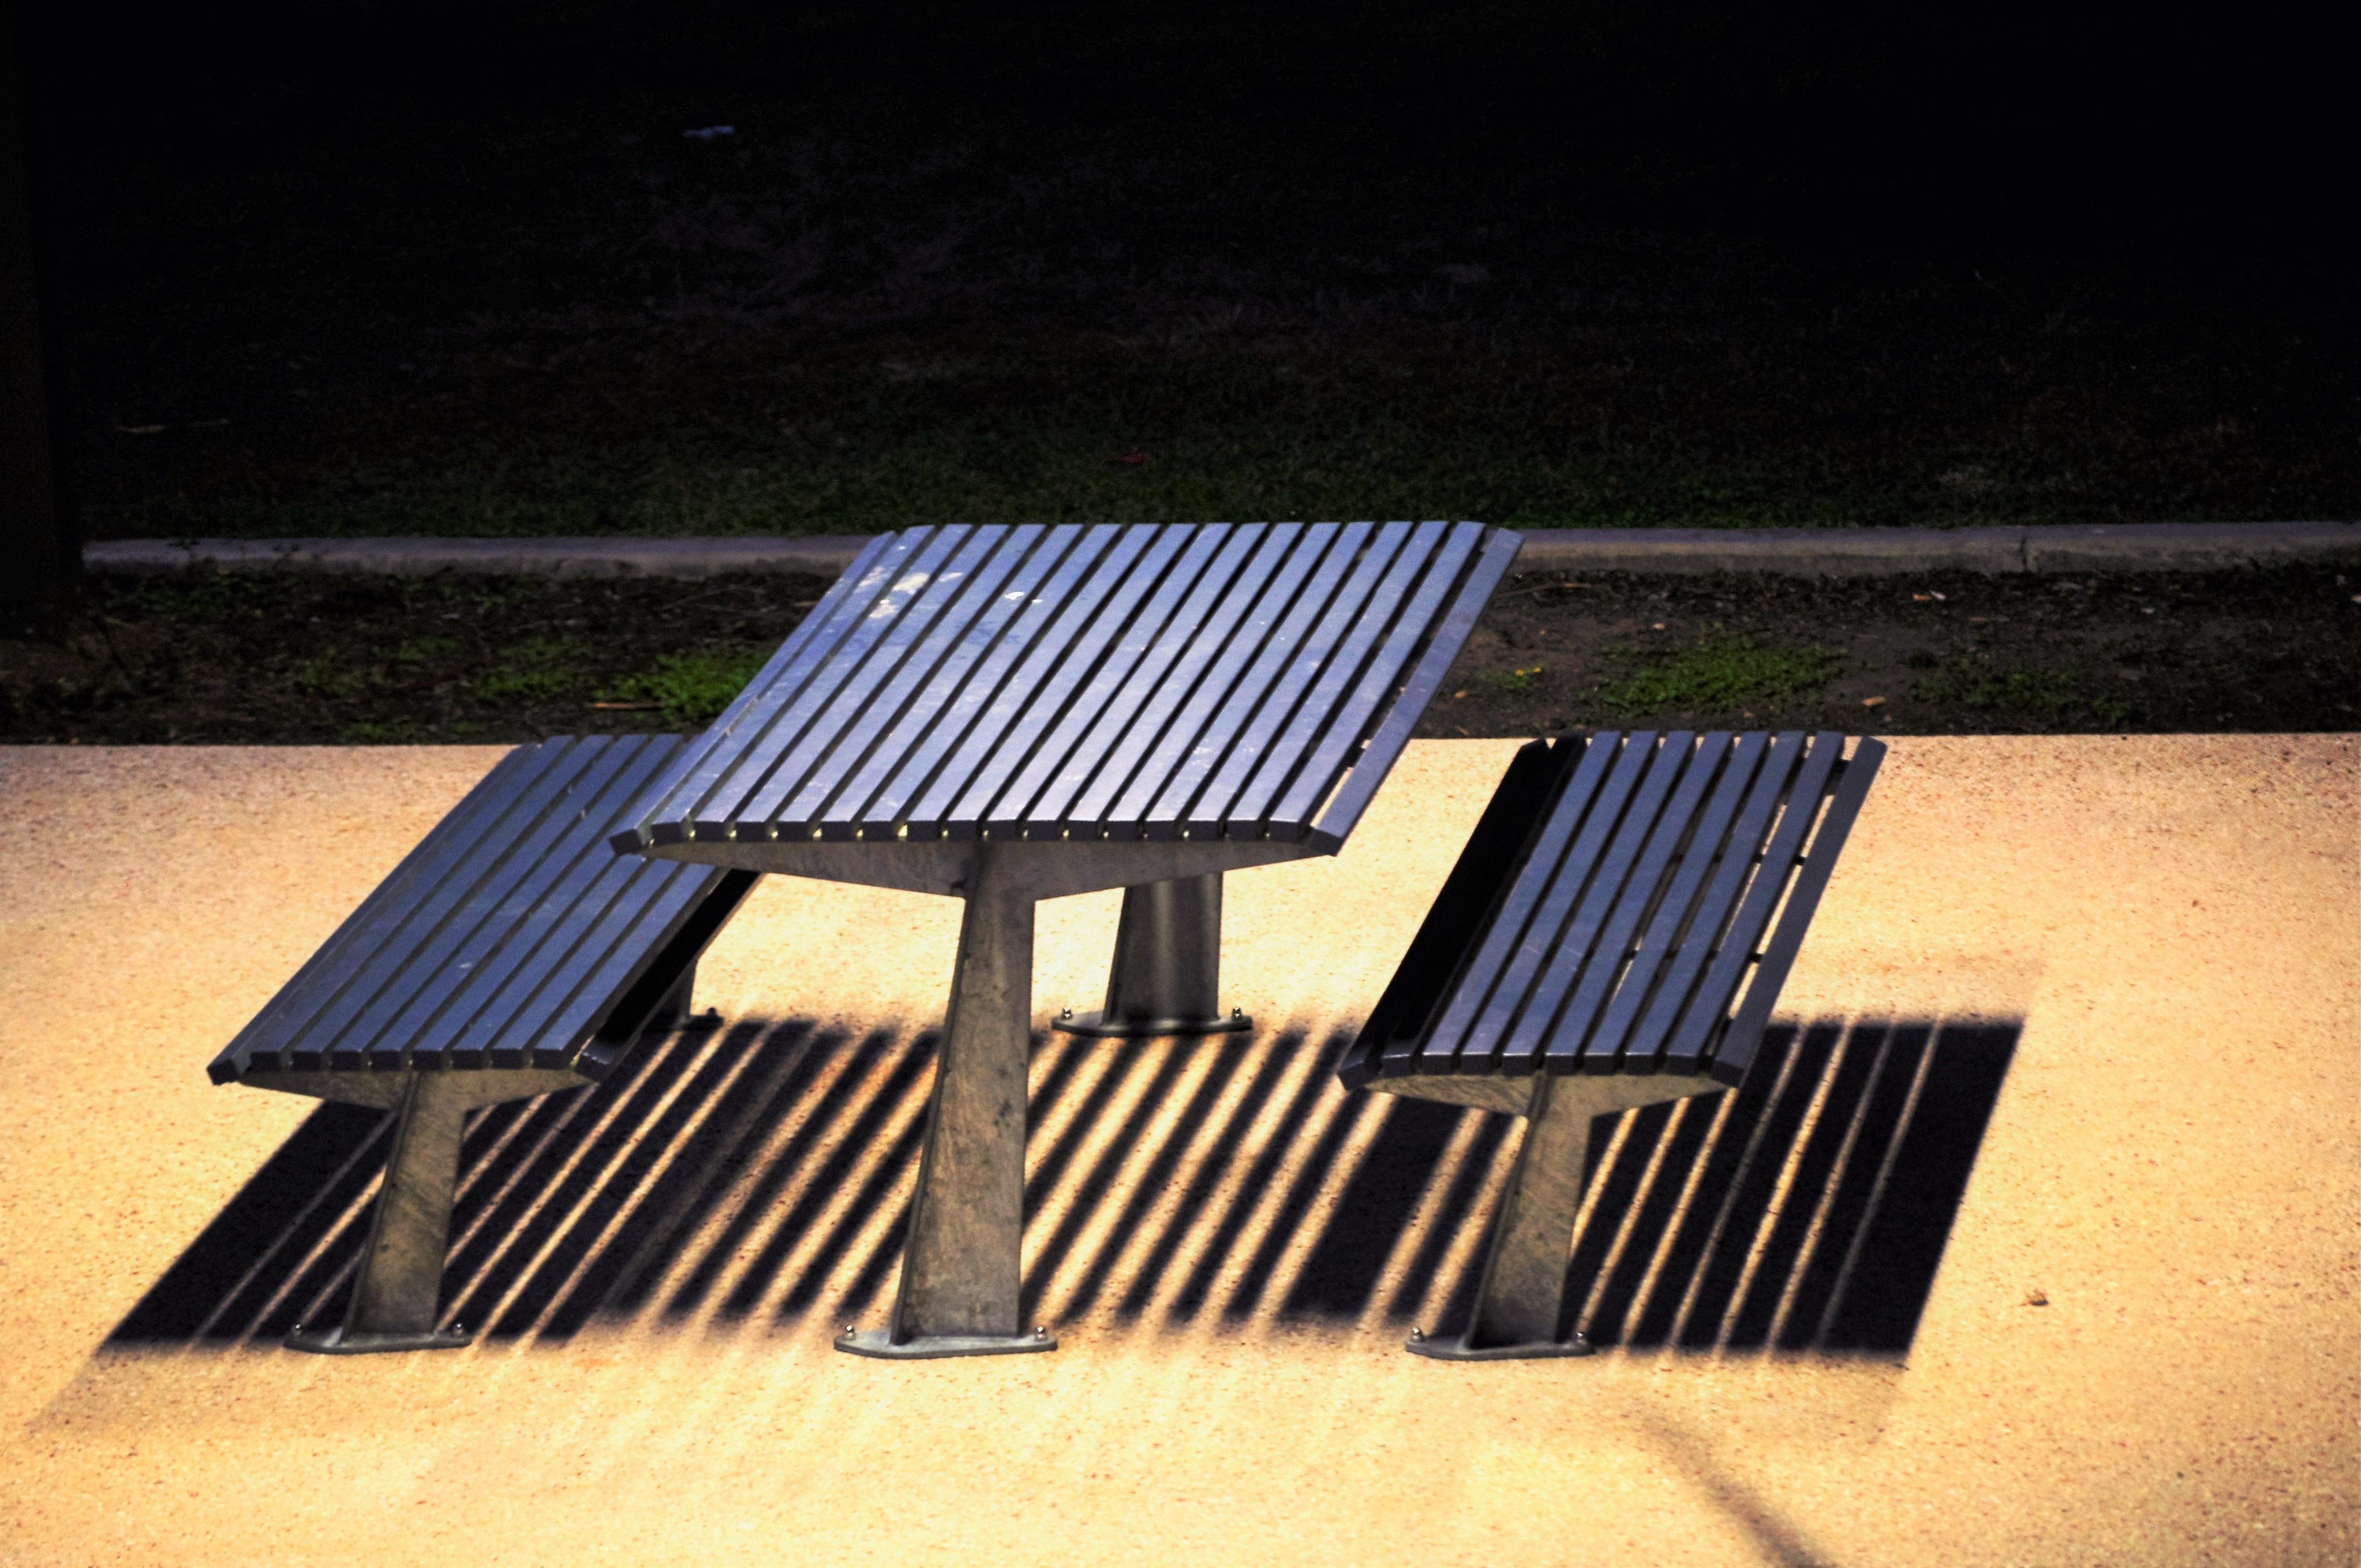 Fotos Gratis Mesa Ala Ligero Tecnolog A Noche Oscuro L Nea  # Muebles Solares